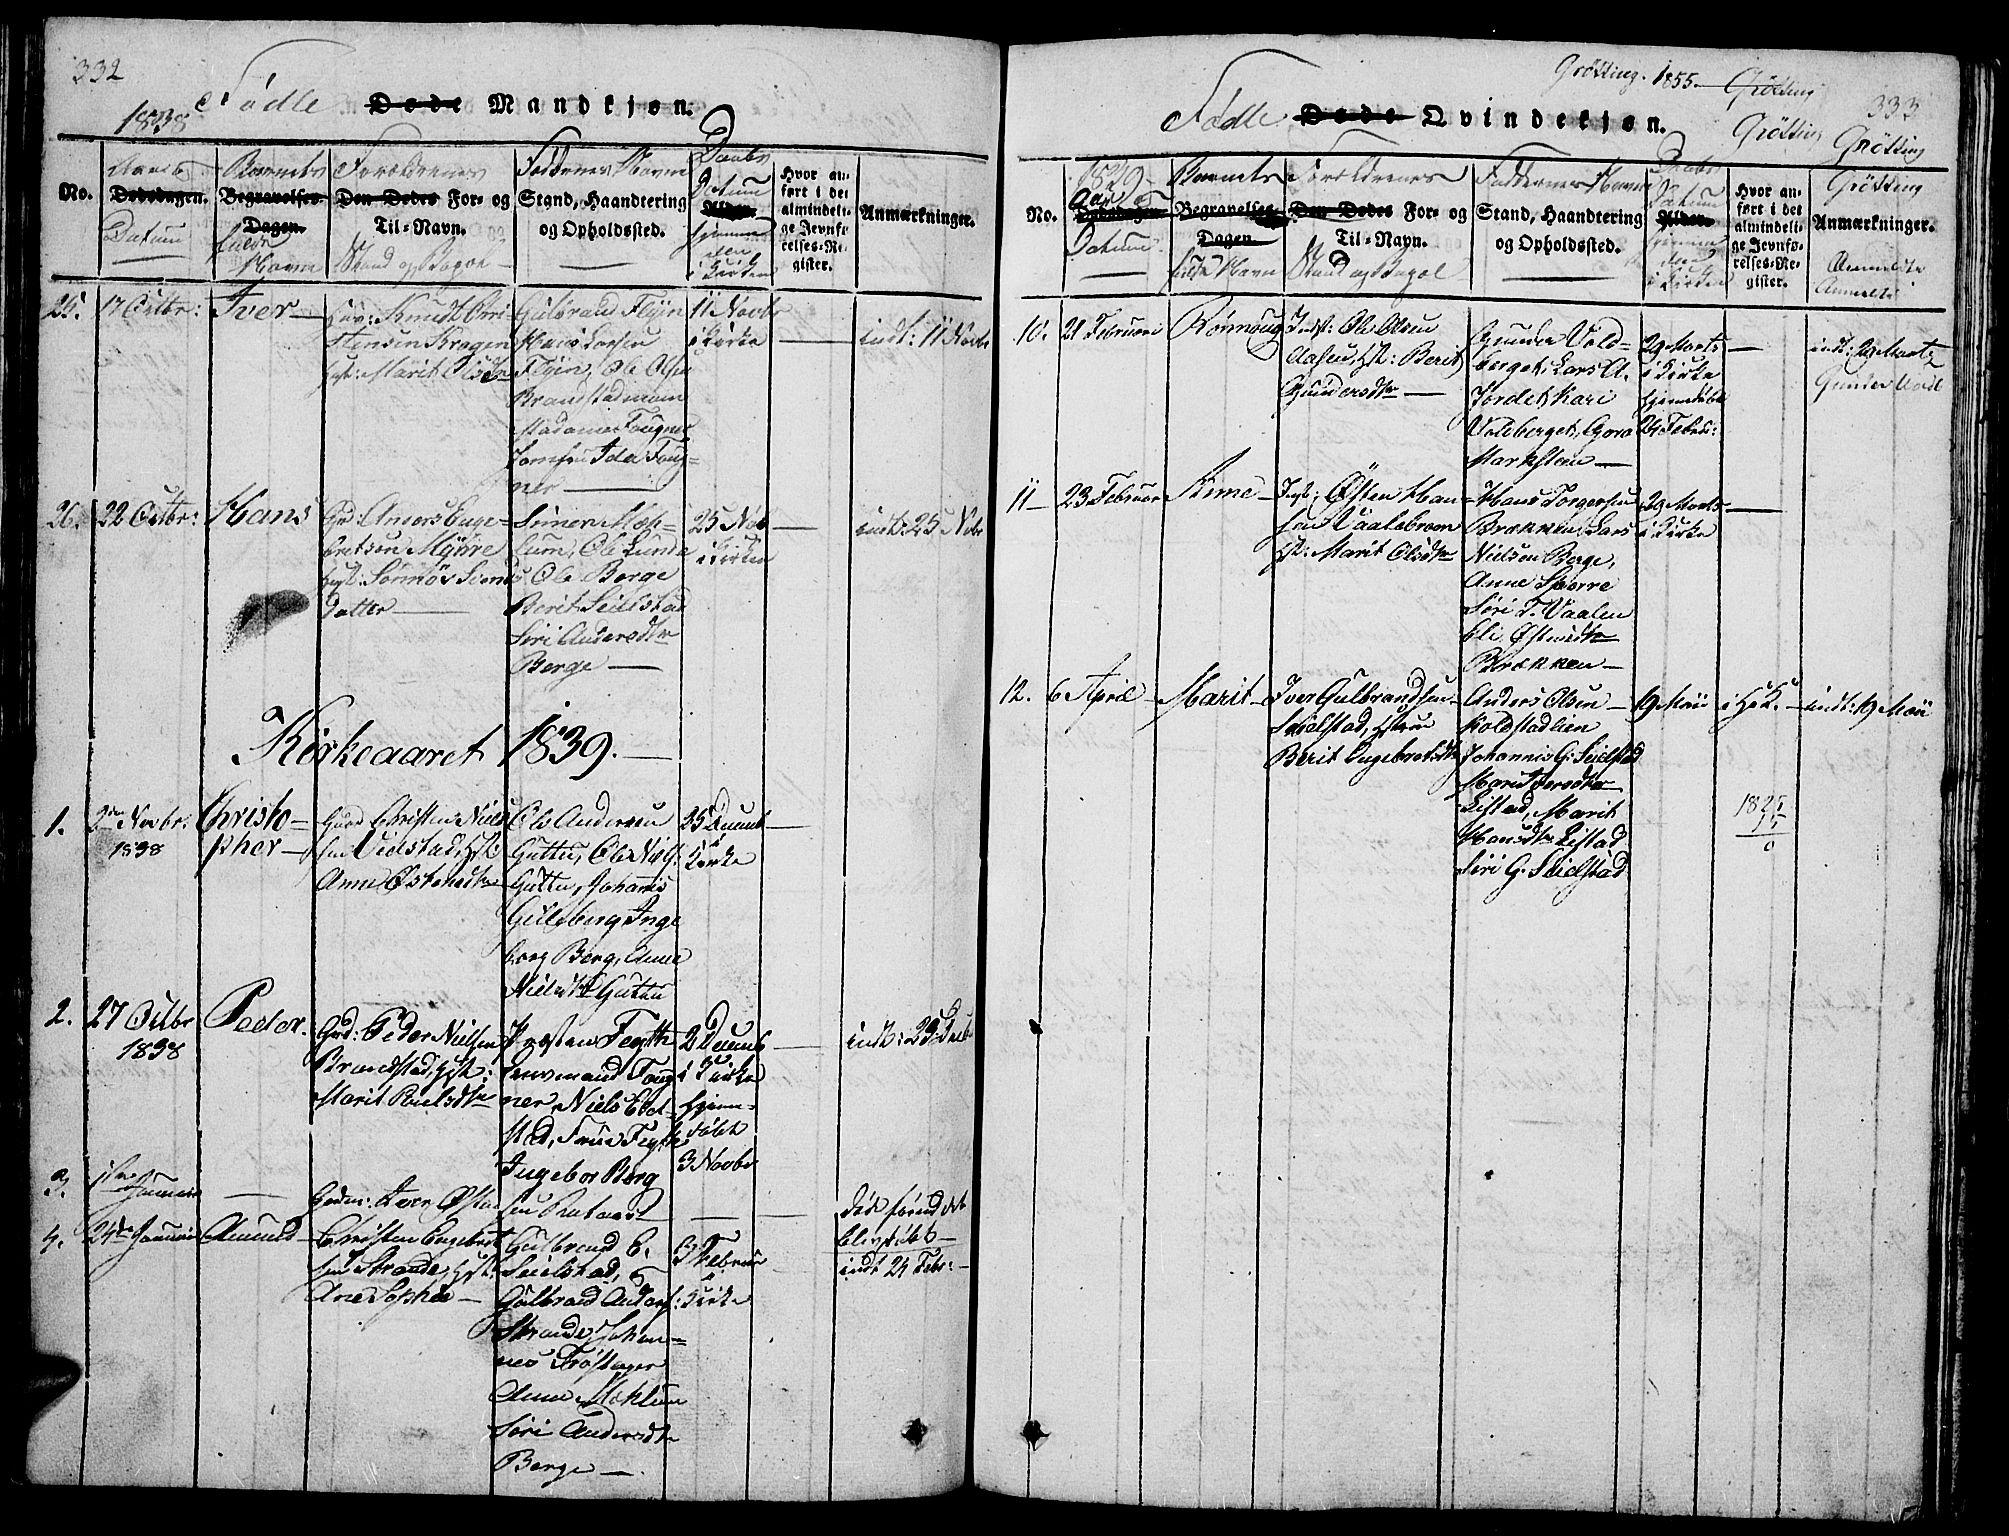 SAH, Ringebu prestekontor, Klokkerbok nr. 1, 1821-1839, s. 332-333